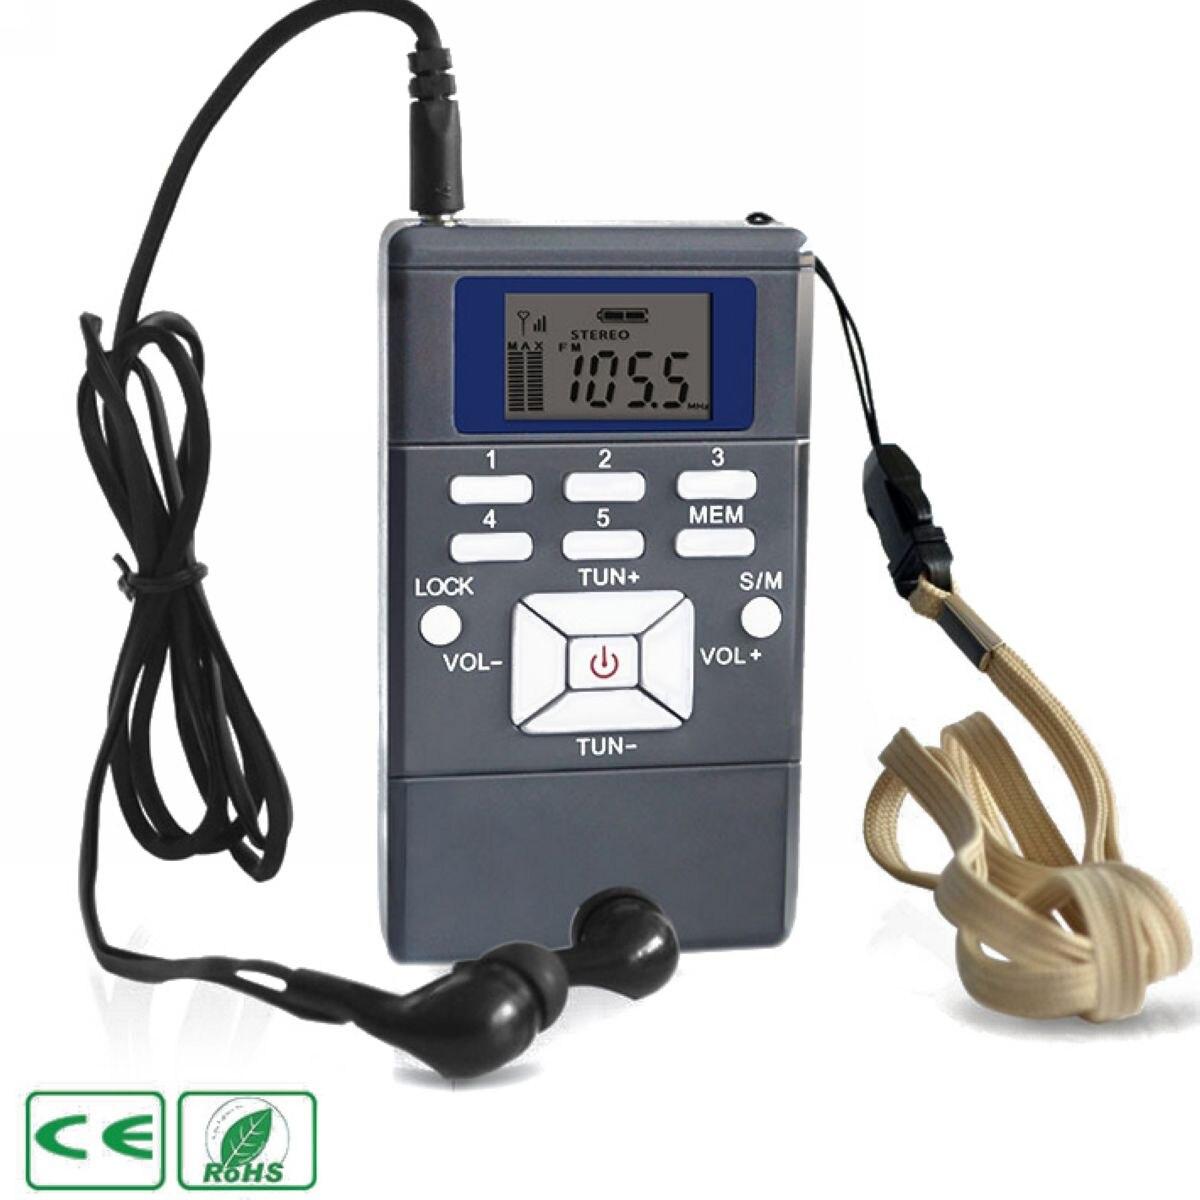 Mayitr 1pc Portable Digital FM Radio Professional Handheld FM Radio Receiver Battery Powered with Earphone